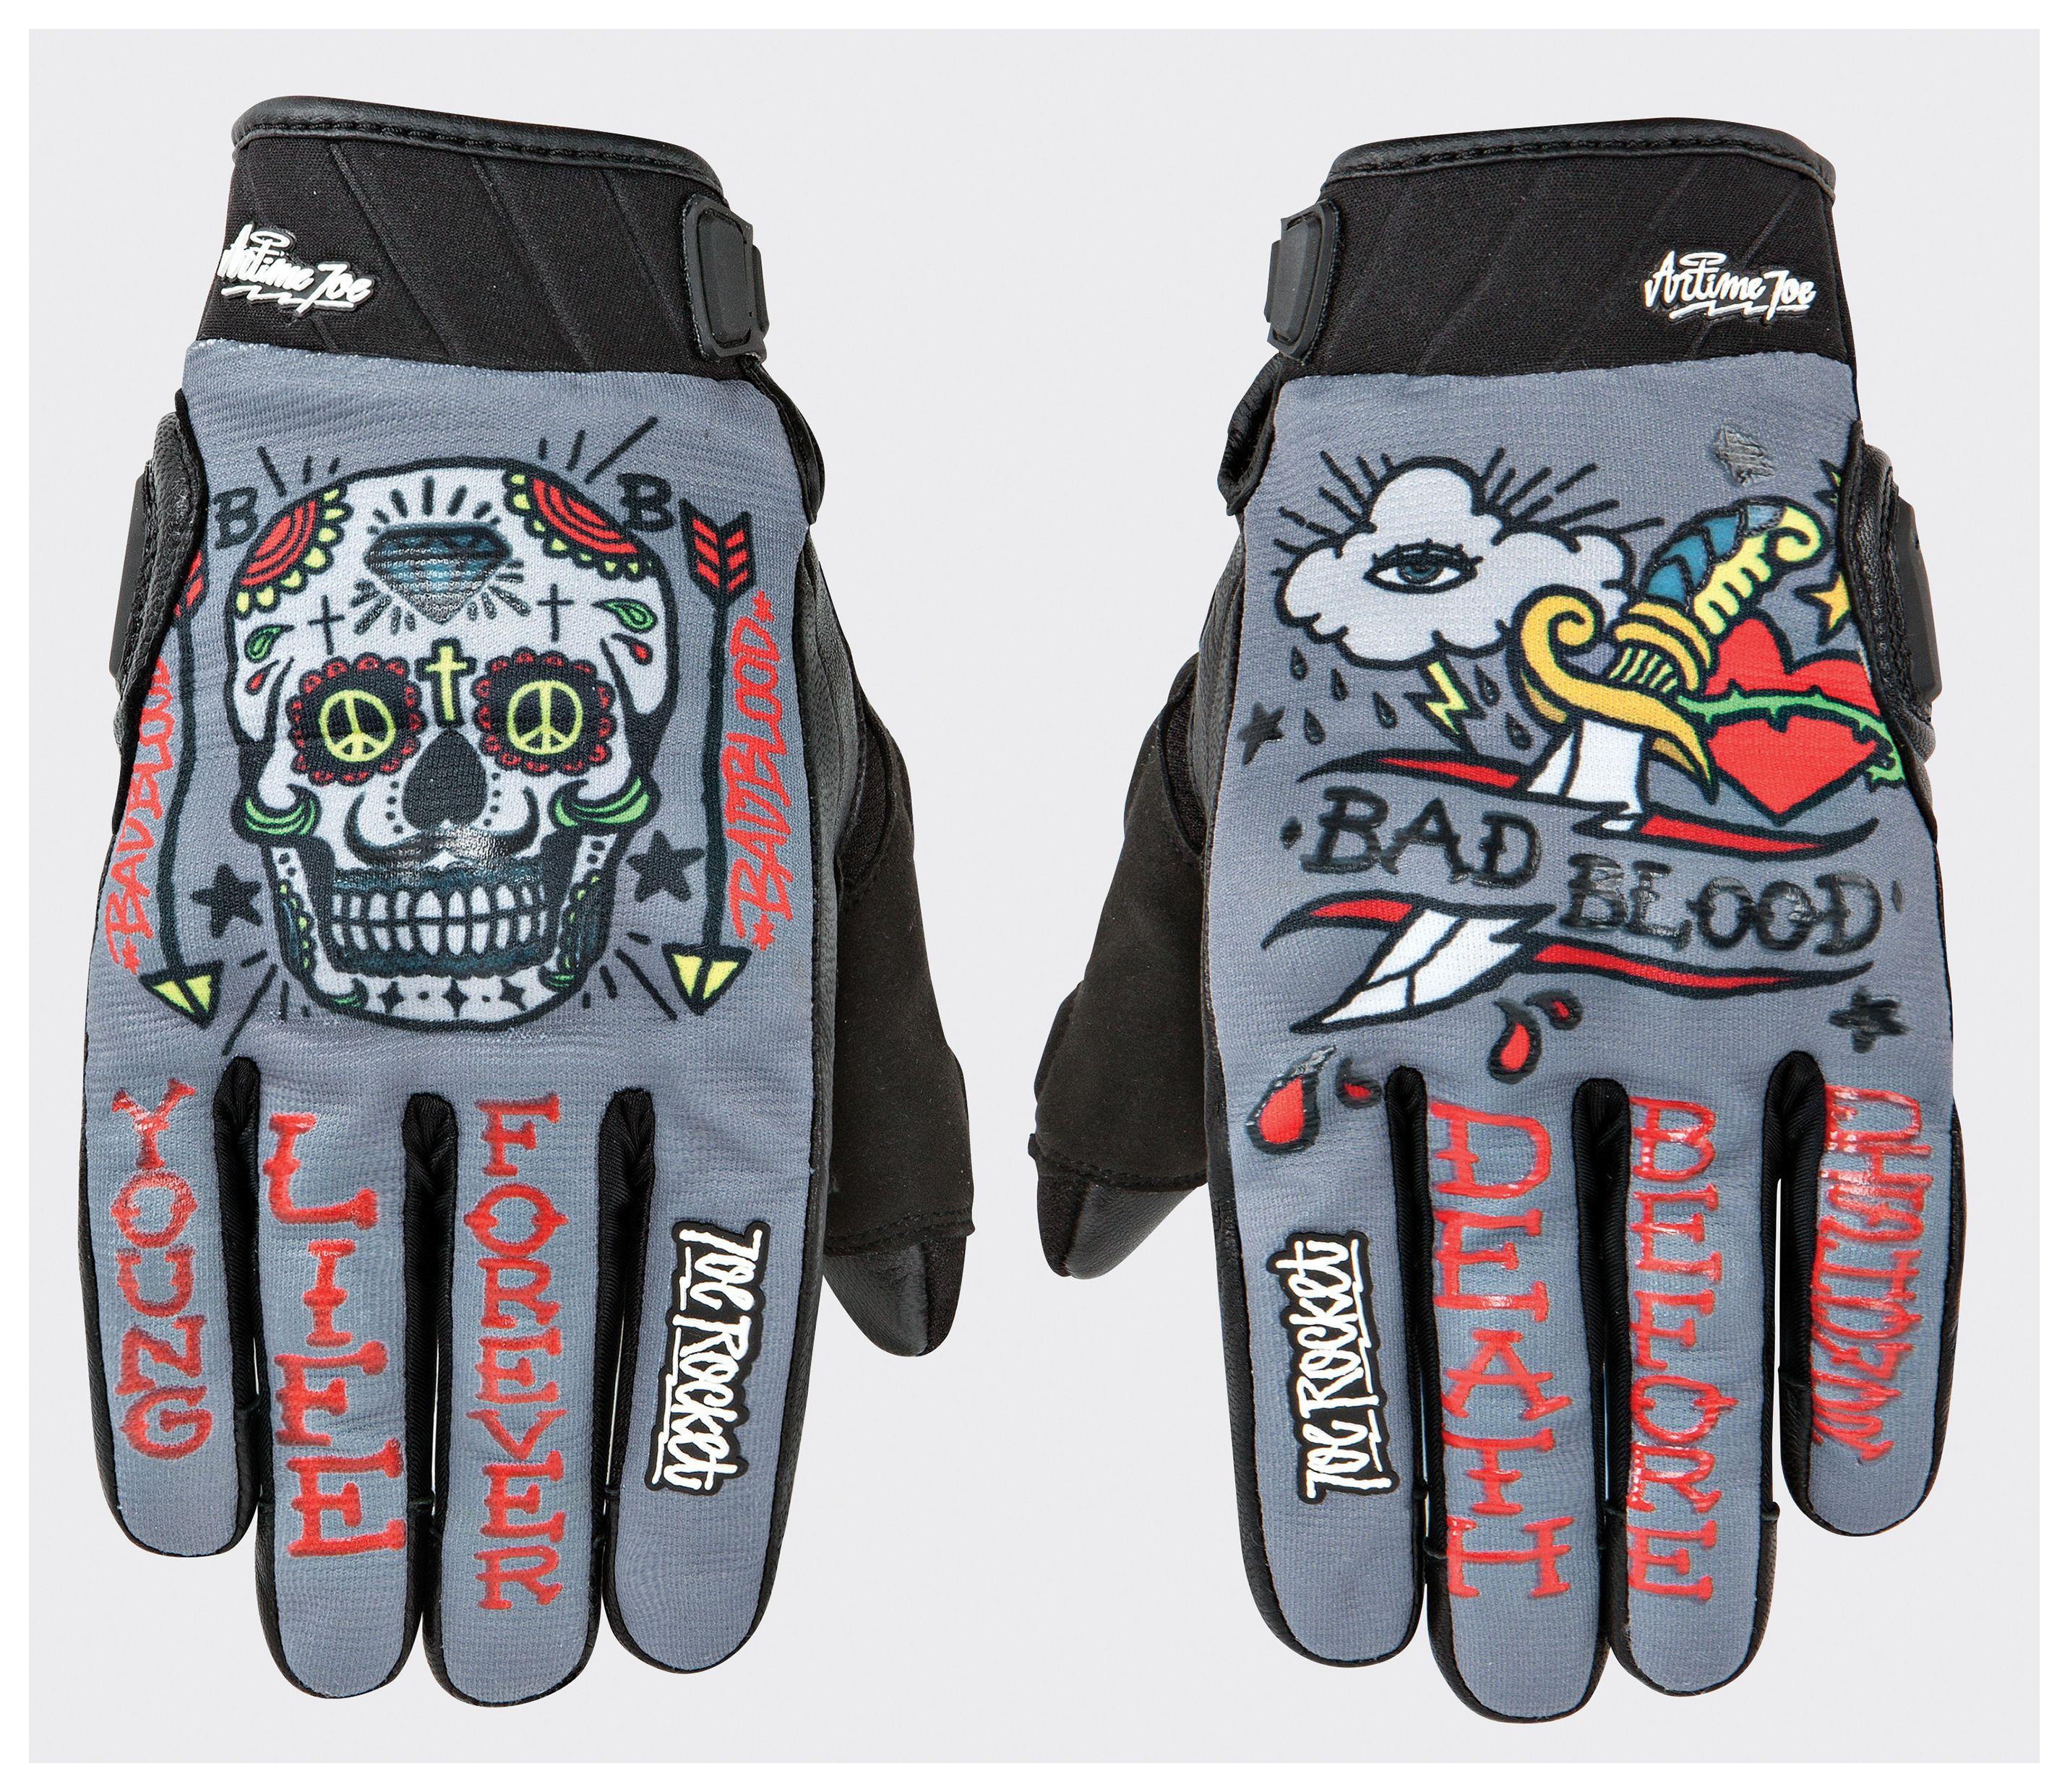 Joe rocket leather motorcycle gloves -  Joe Rocket Artime Joe Bad Blood Gloves Revzilla